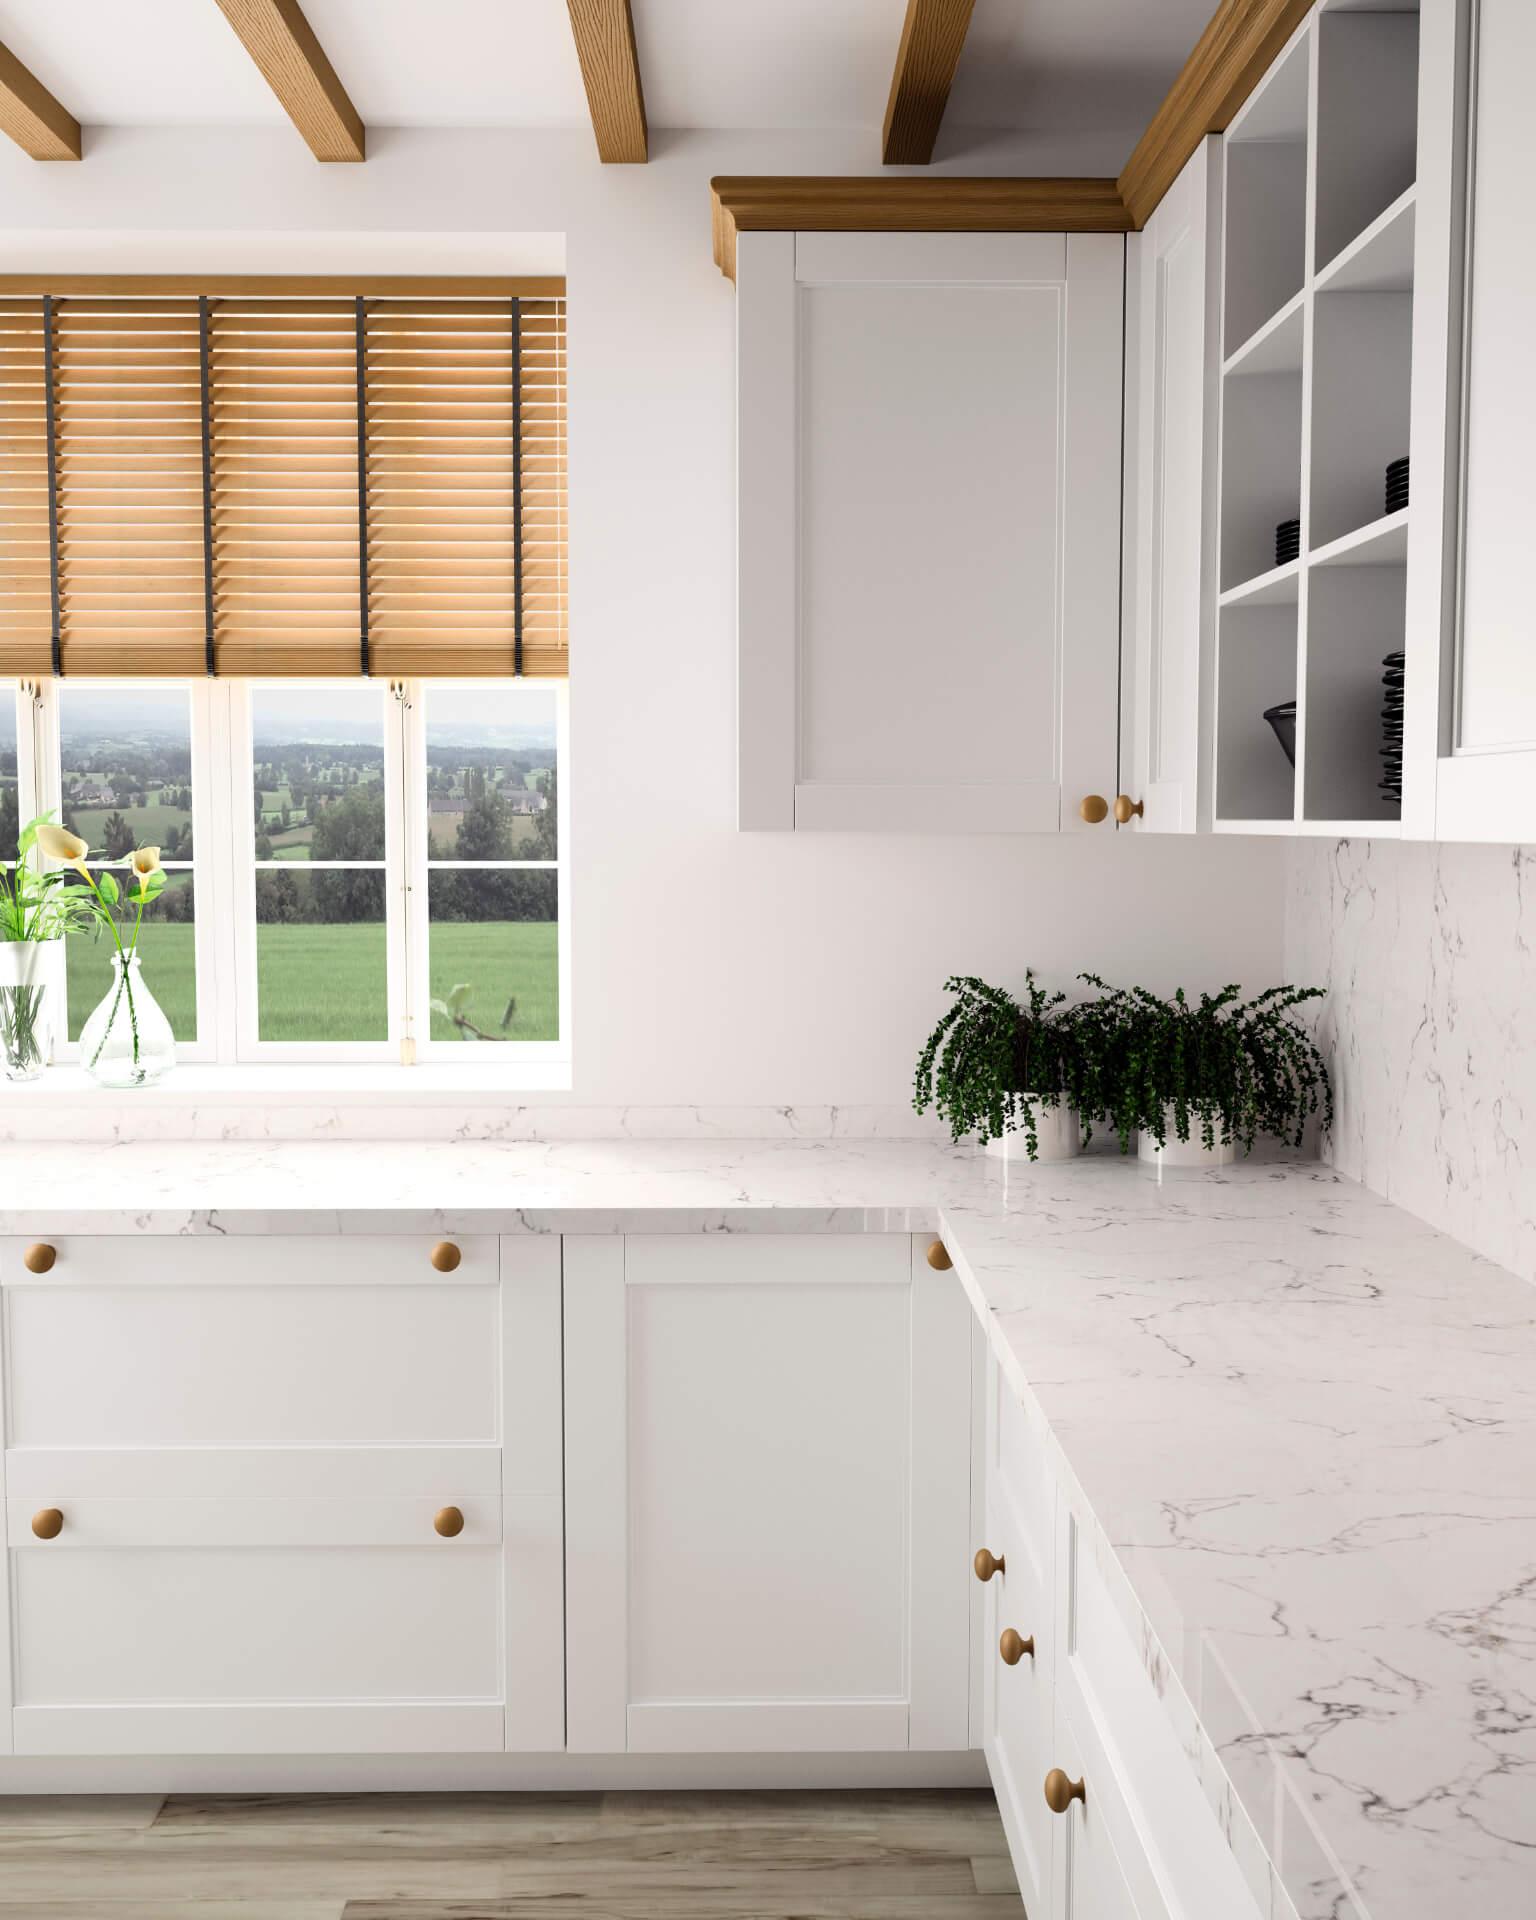 Cosentino Silestone White Kitchen